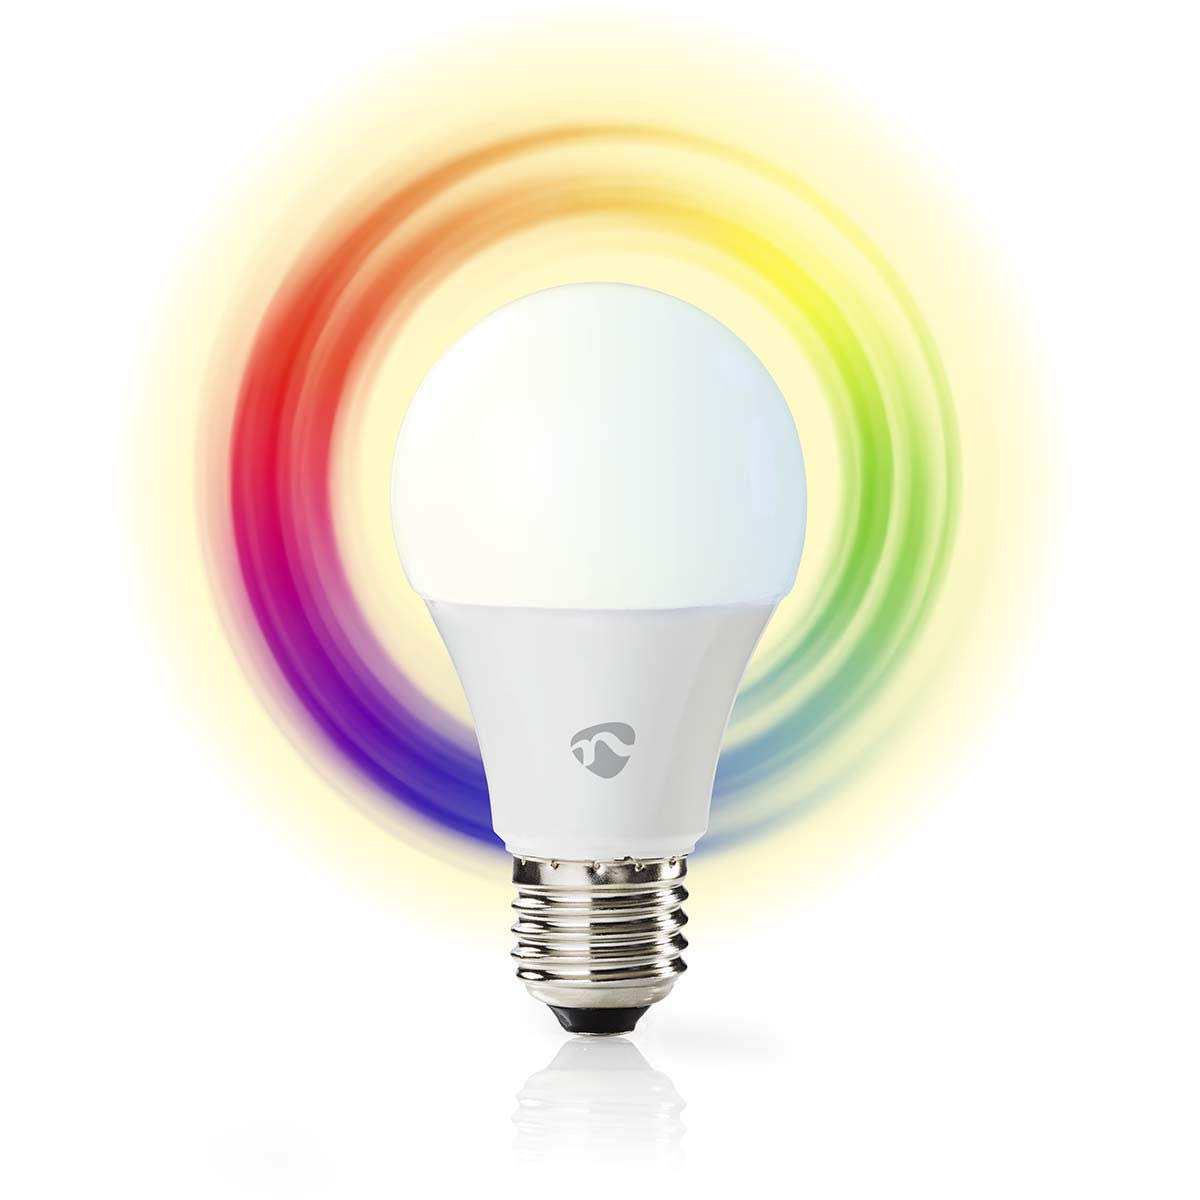 TronicXL 4 Stück RGB WiFi WLAN Lampe LED Leuchtmittel Smart Glühlampe E27 für amazon Alexa Google Home